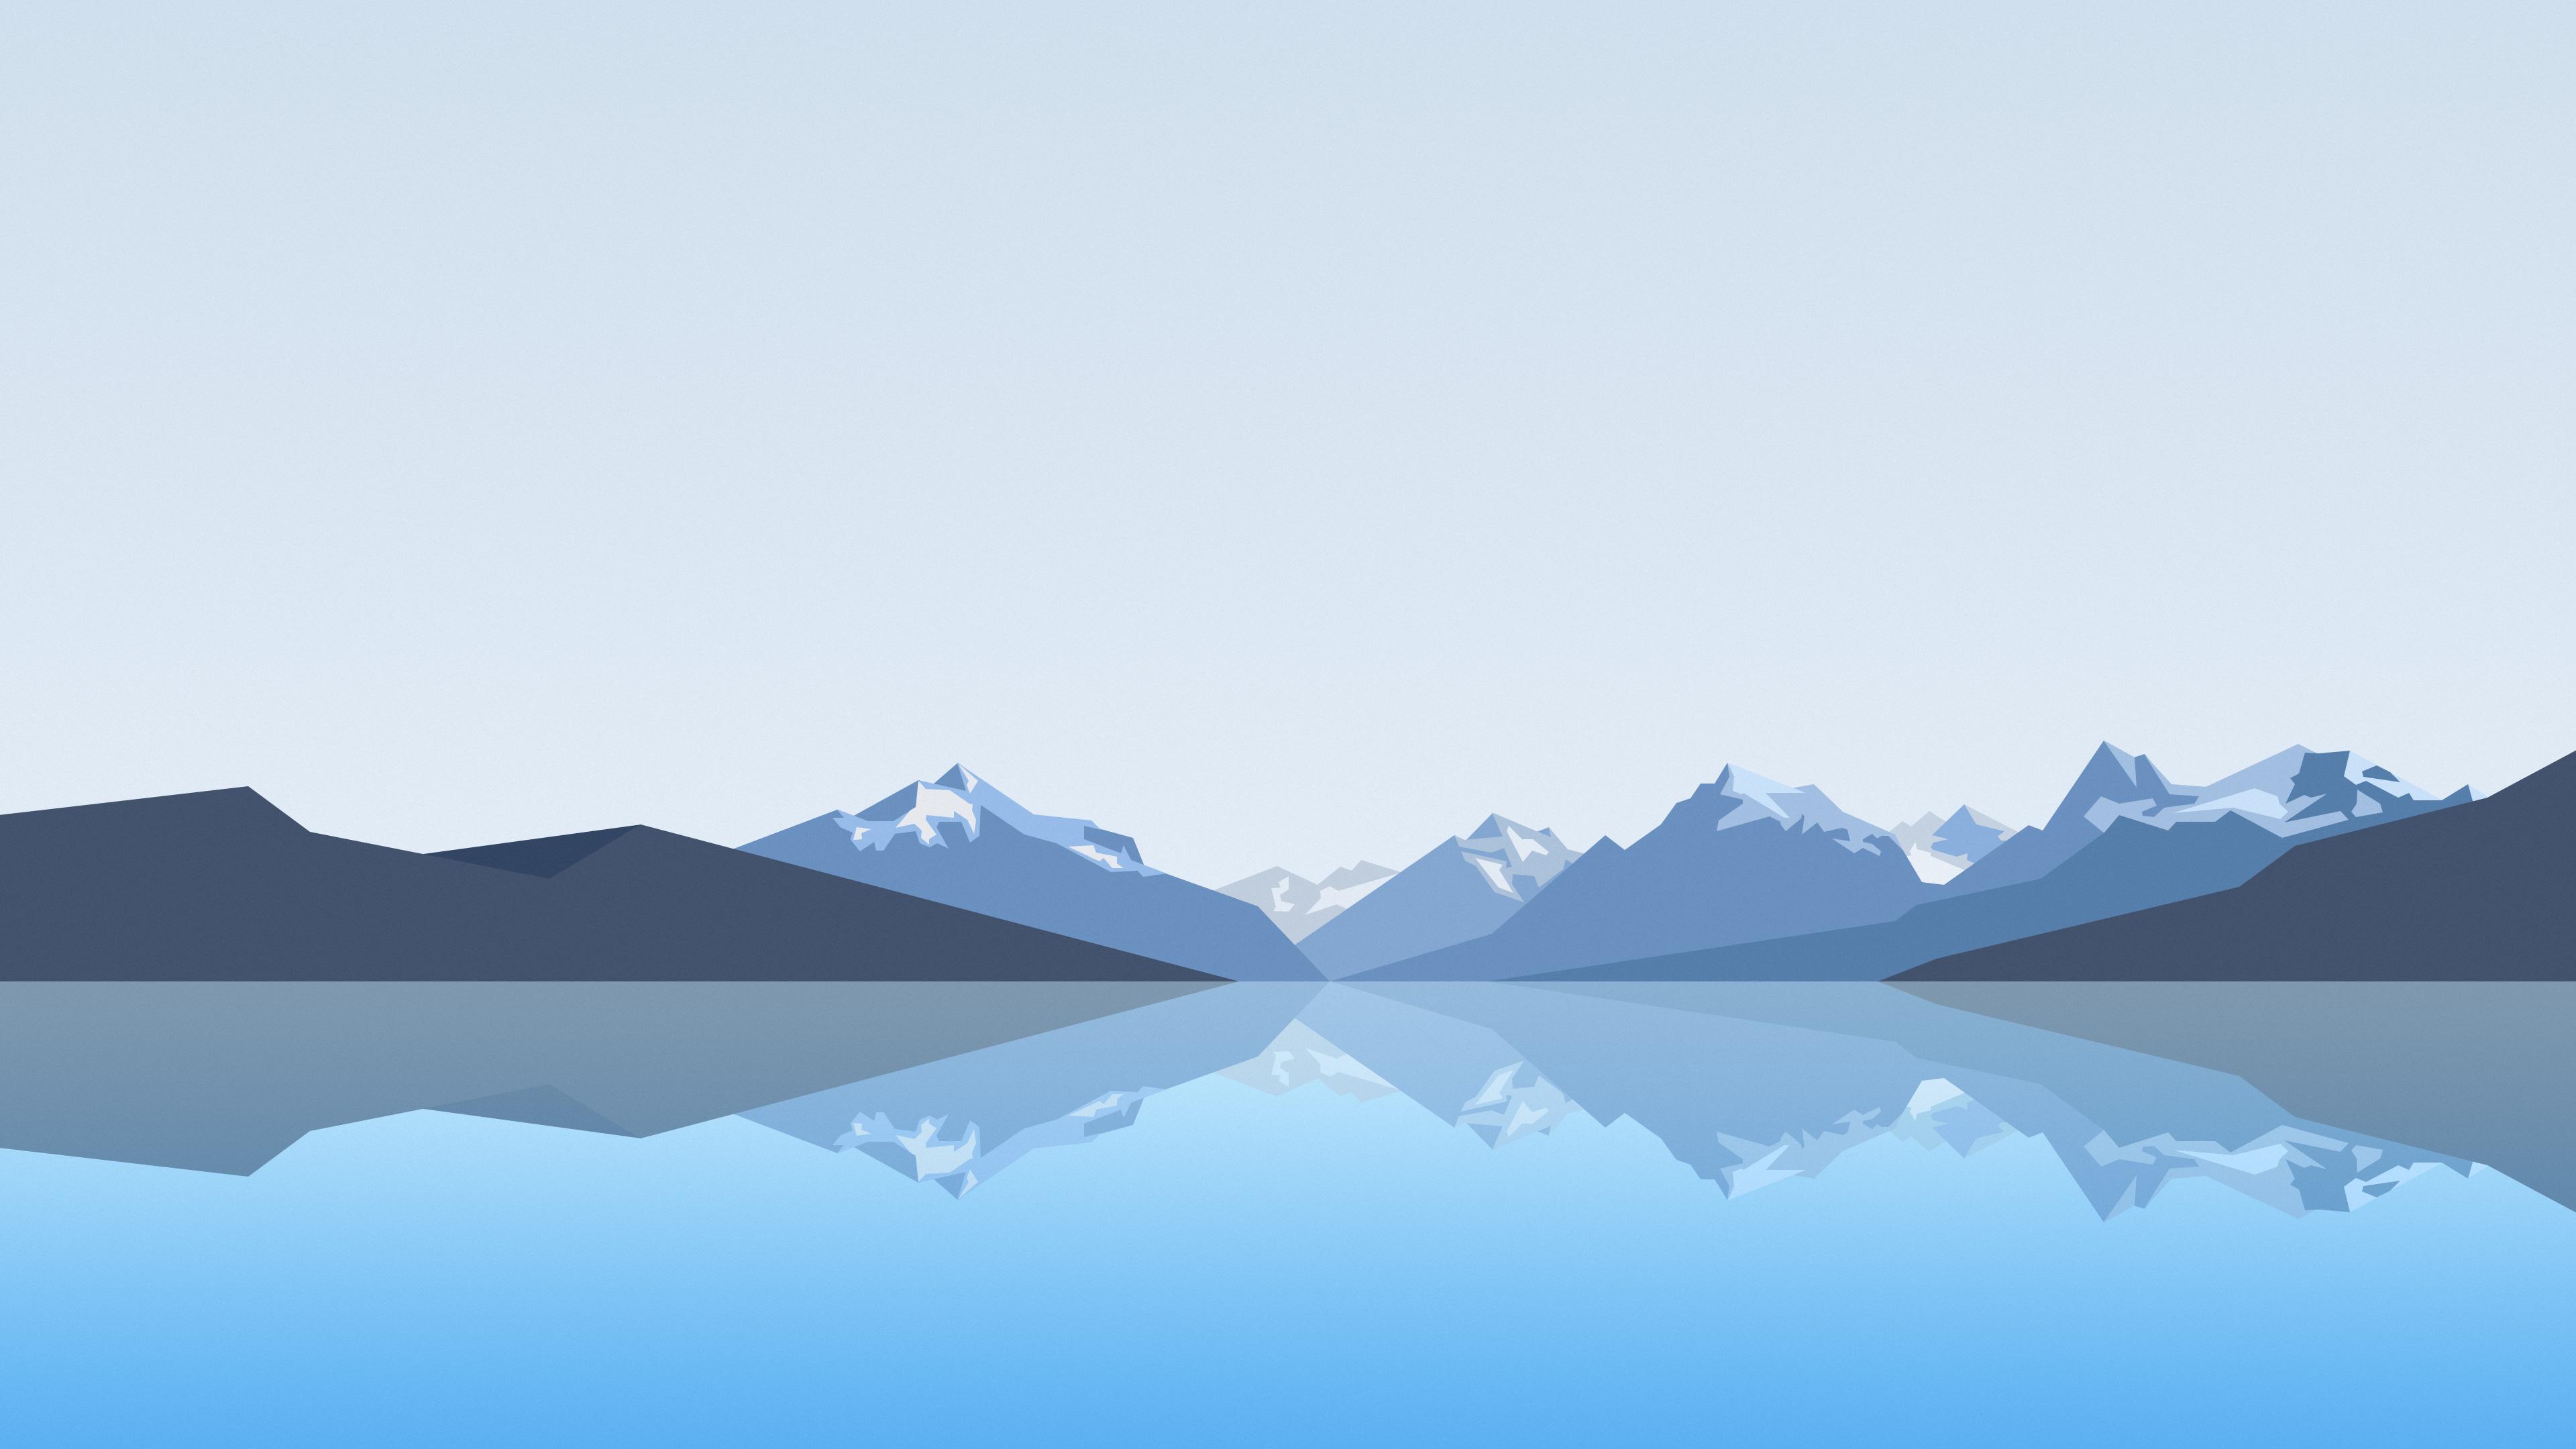 reflection lake landscape mountains 4k 1540755587 - Reflection Lake Landscape Mountains 4k - reflection wallpapers, mountains wallpapers, landscape wallpapers, lake wallpapers, hd-wallpapers, digital art wallpapers, deviantart wallpapers, artwork wallpapers, artist wallpapers, 4k-wallpapers